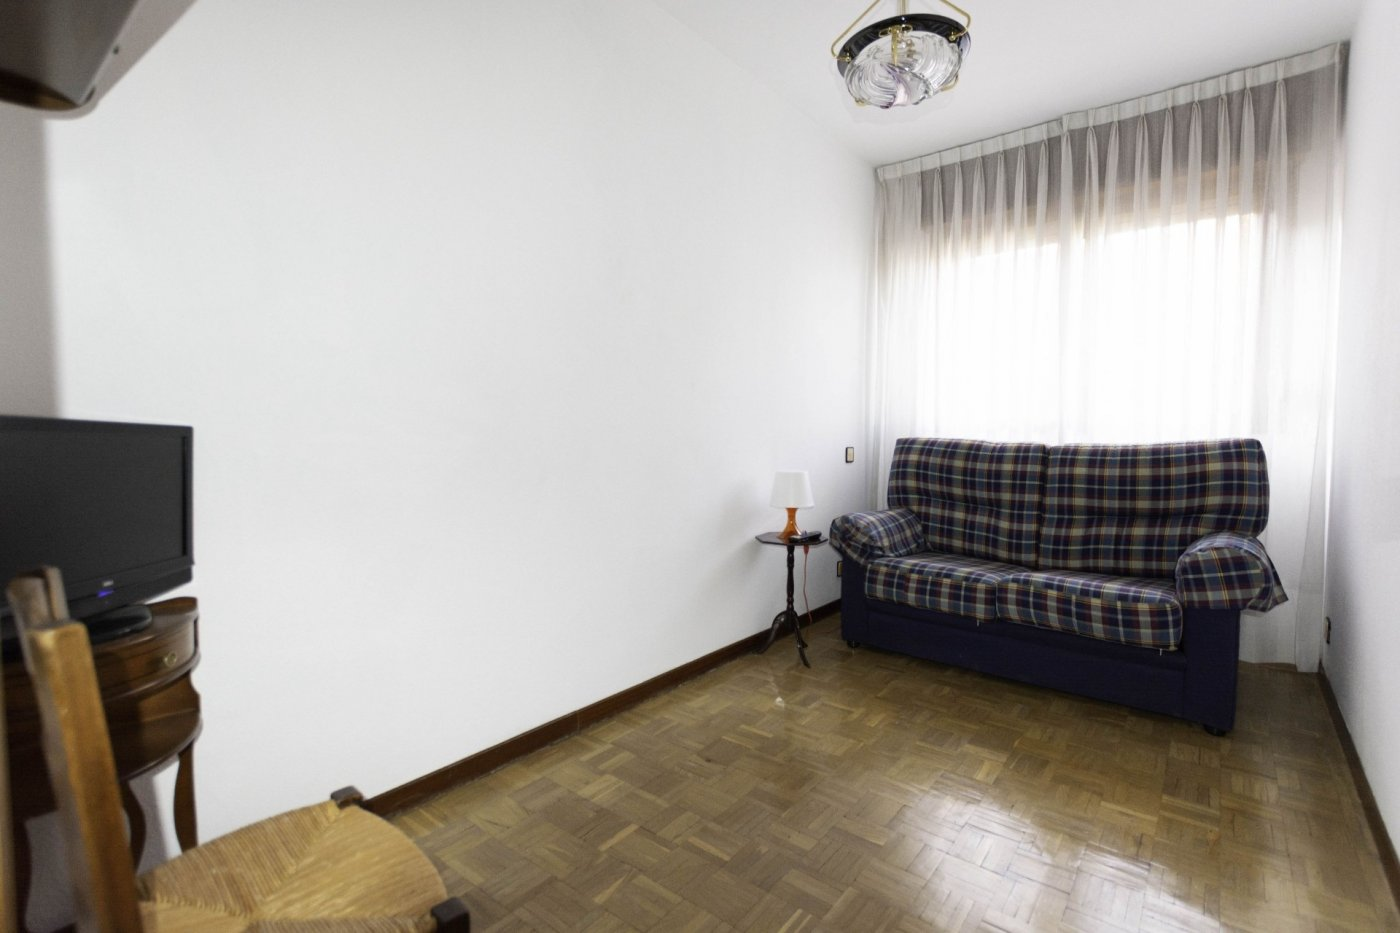 Apartamento en vallobin - imagenInmueble3